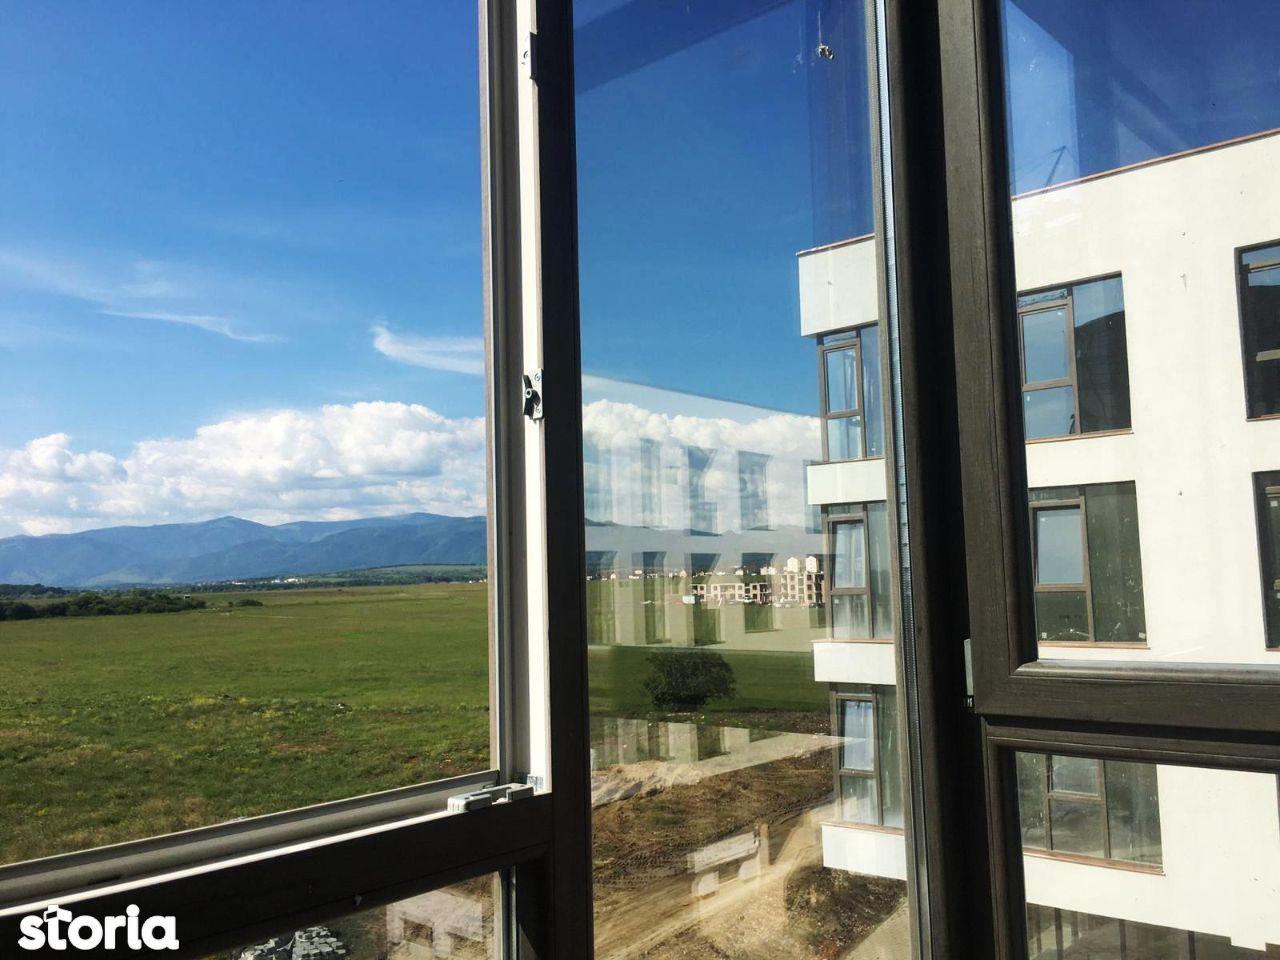 Etaj 2 Apartament 2 camere 82 mp Azure Residence Doamna Stanca